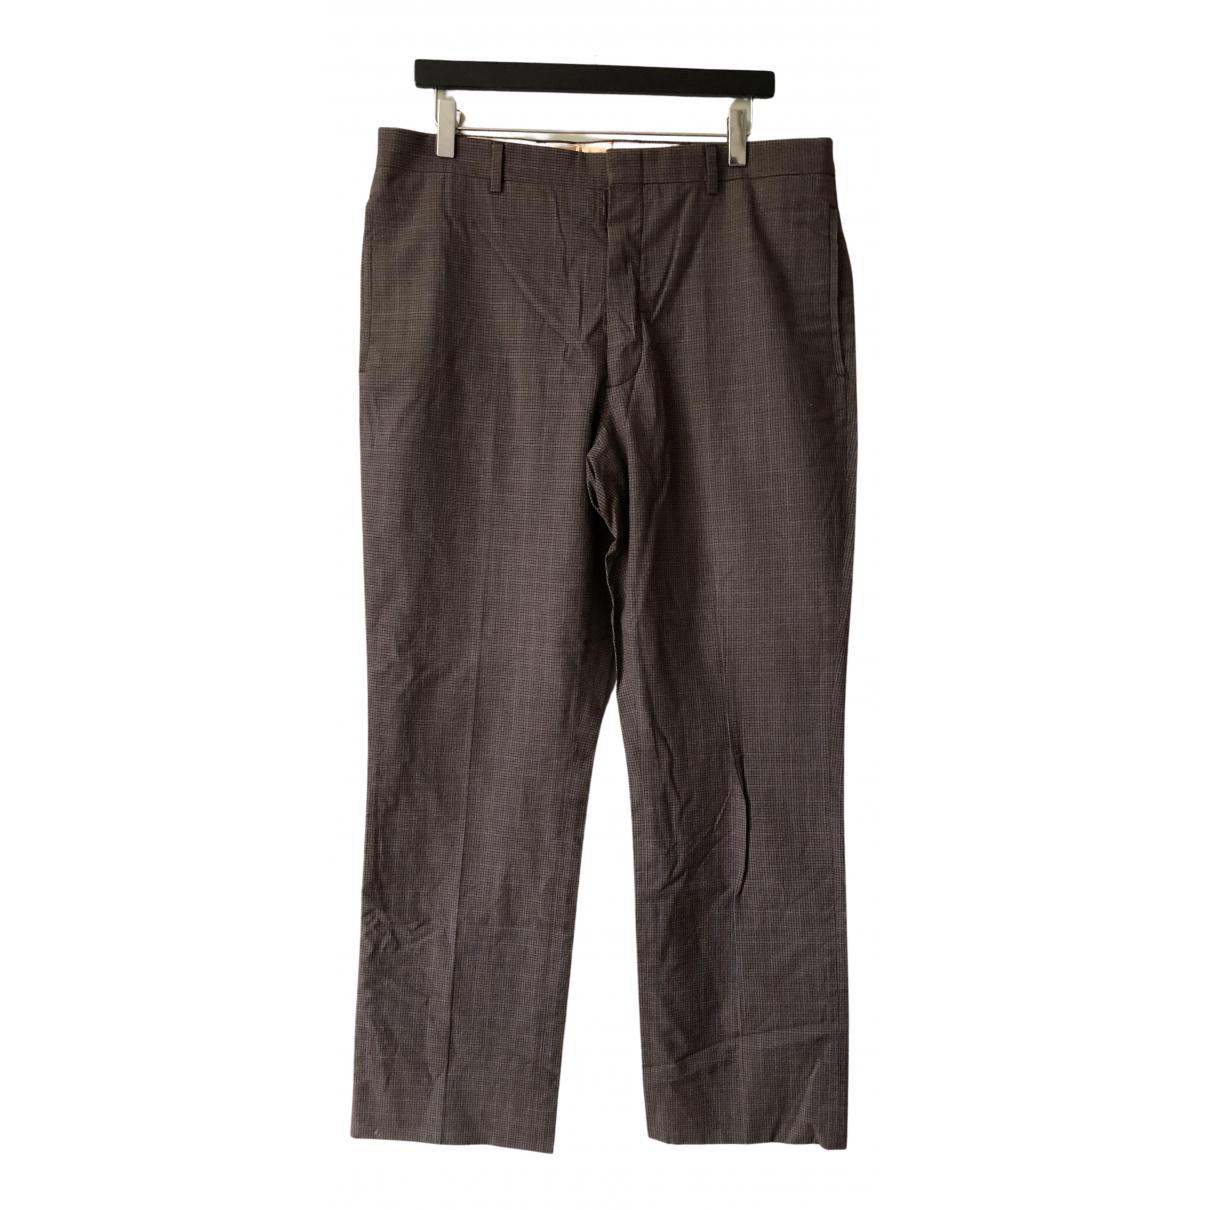 Miu Miu N Brown Cotton Trousers for Men 52 IT